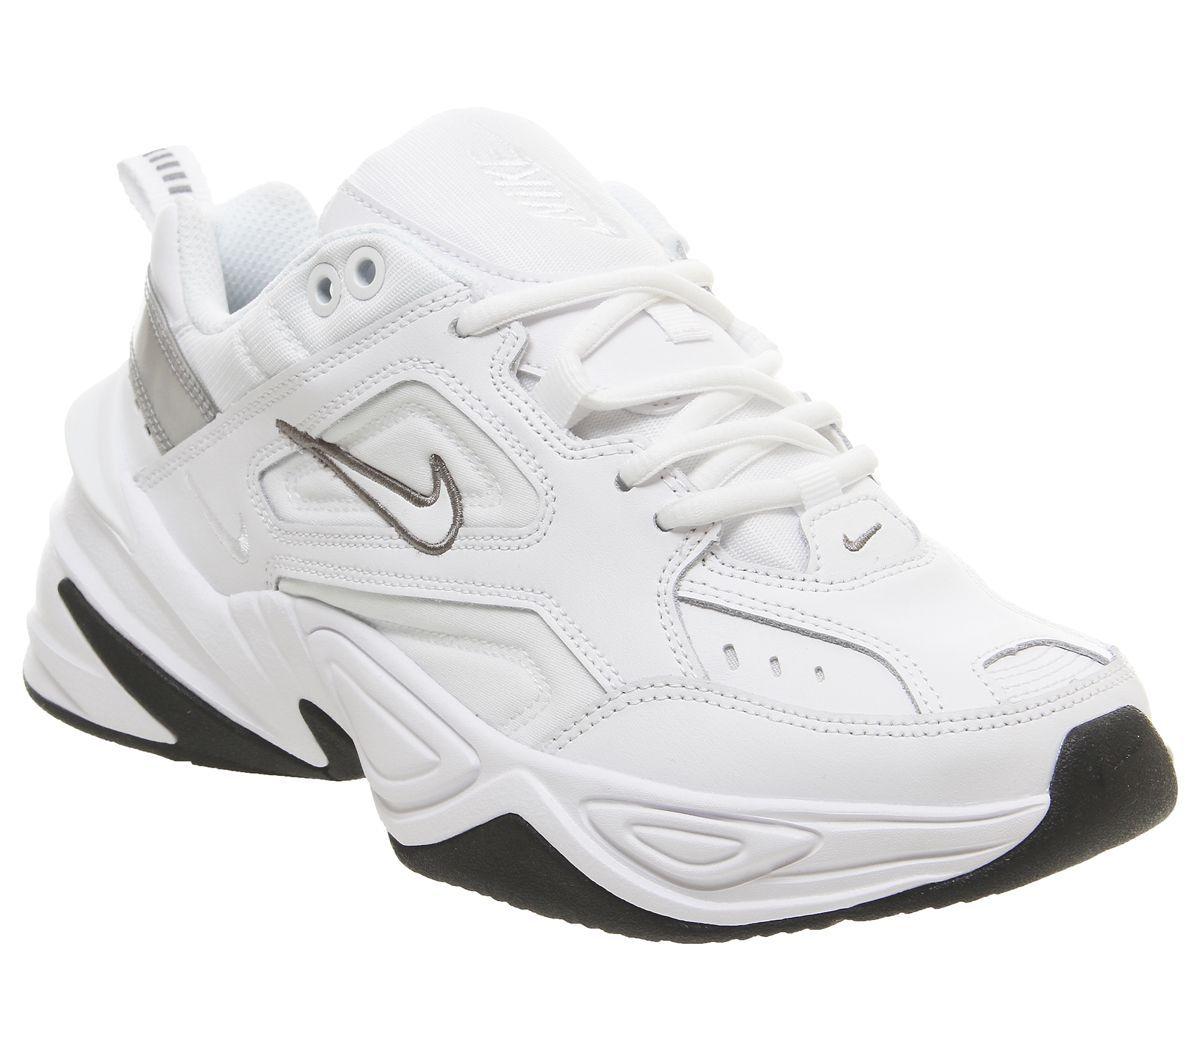 Nike M2k Tekno Trainers White Cool Grey Black - Hers ...